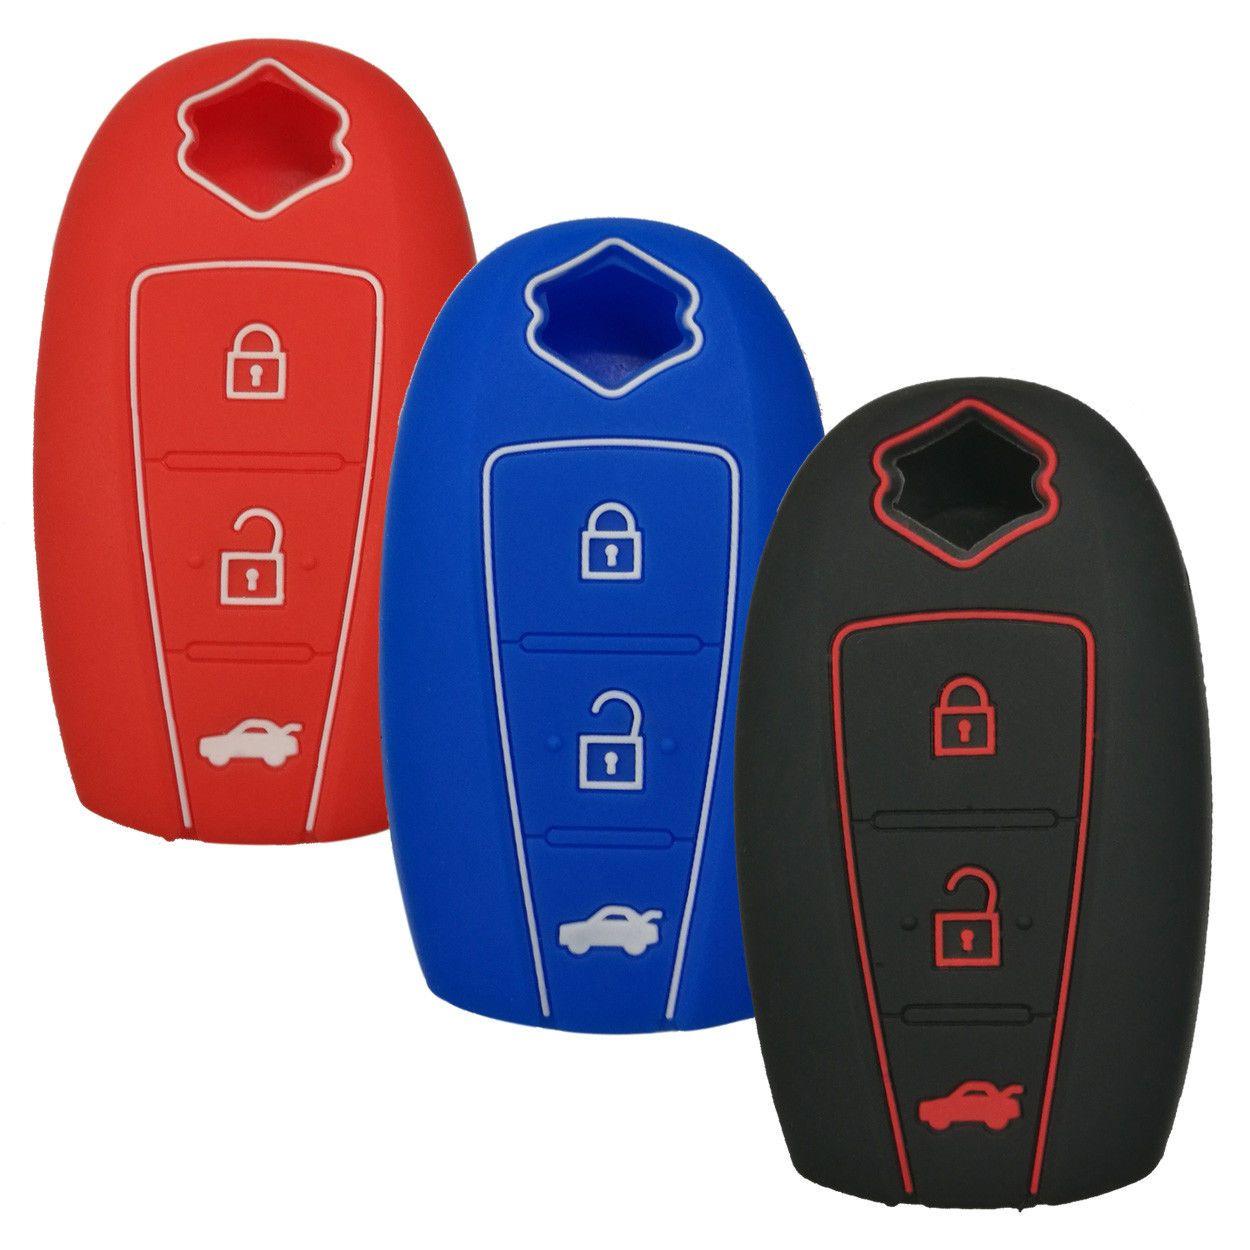 Black Fob Remote Key Case Cover Holder for SUZUKI S-Cross Swift SX4 Kizashi Gift